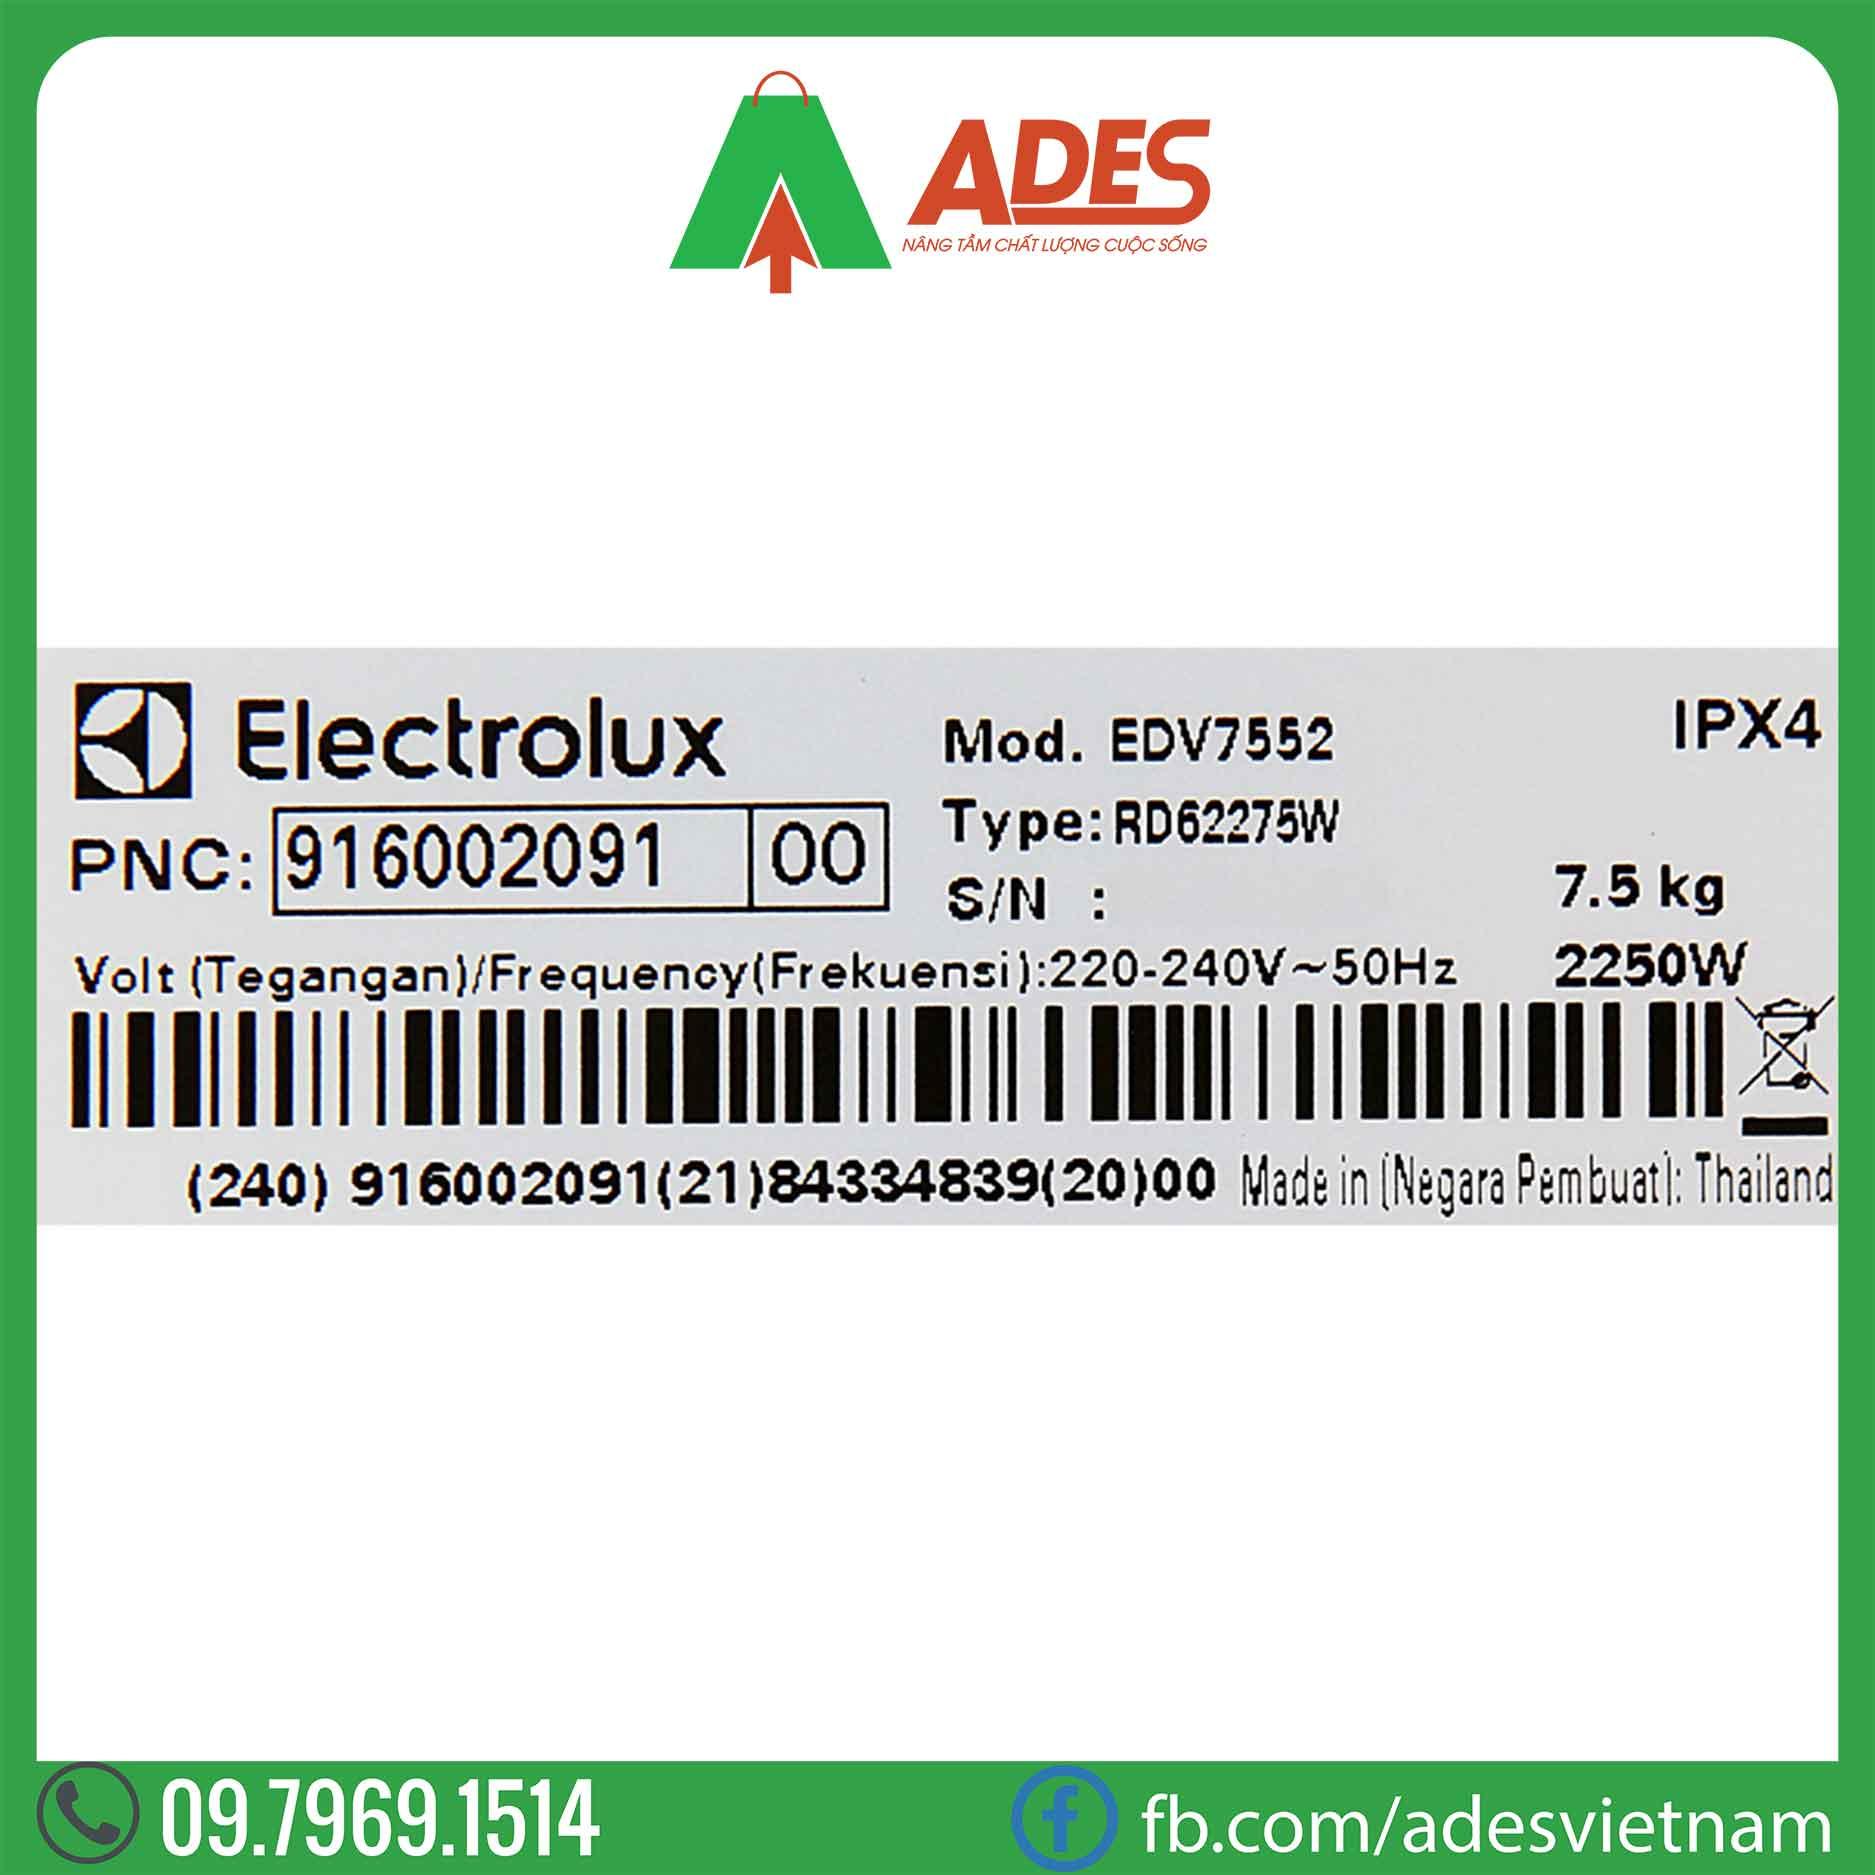 May say Electrolux 7.5 Kg EDV7552